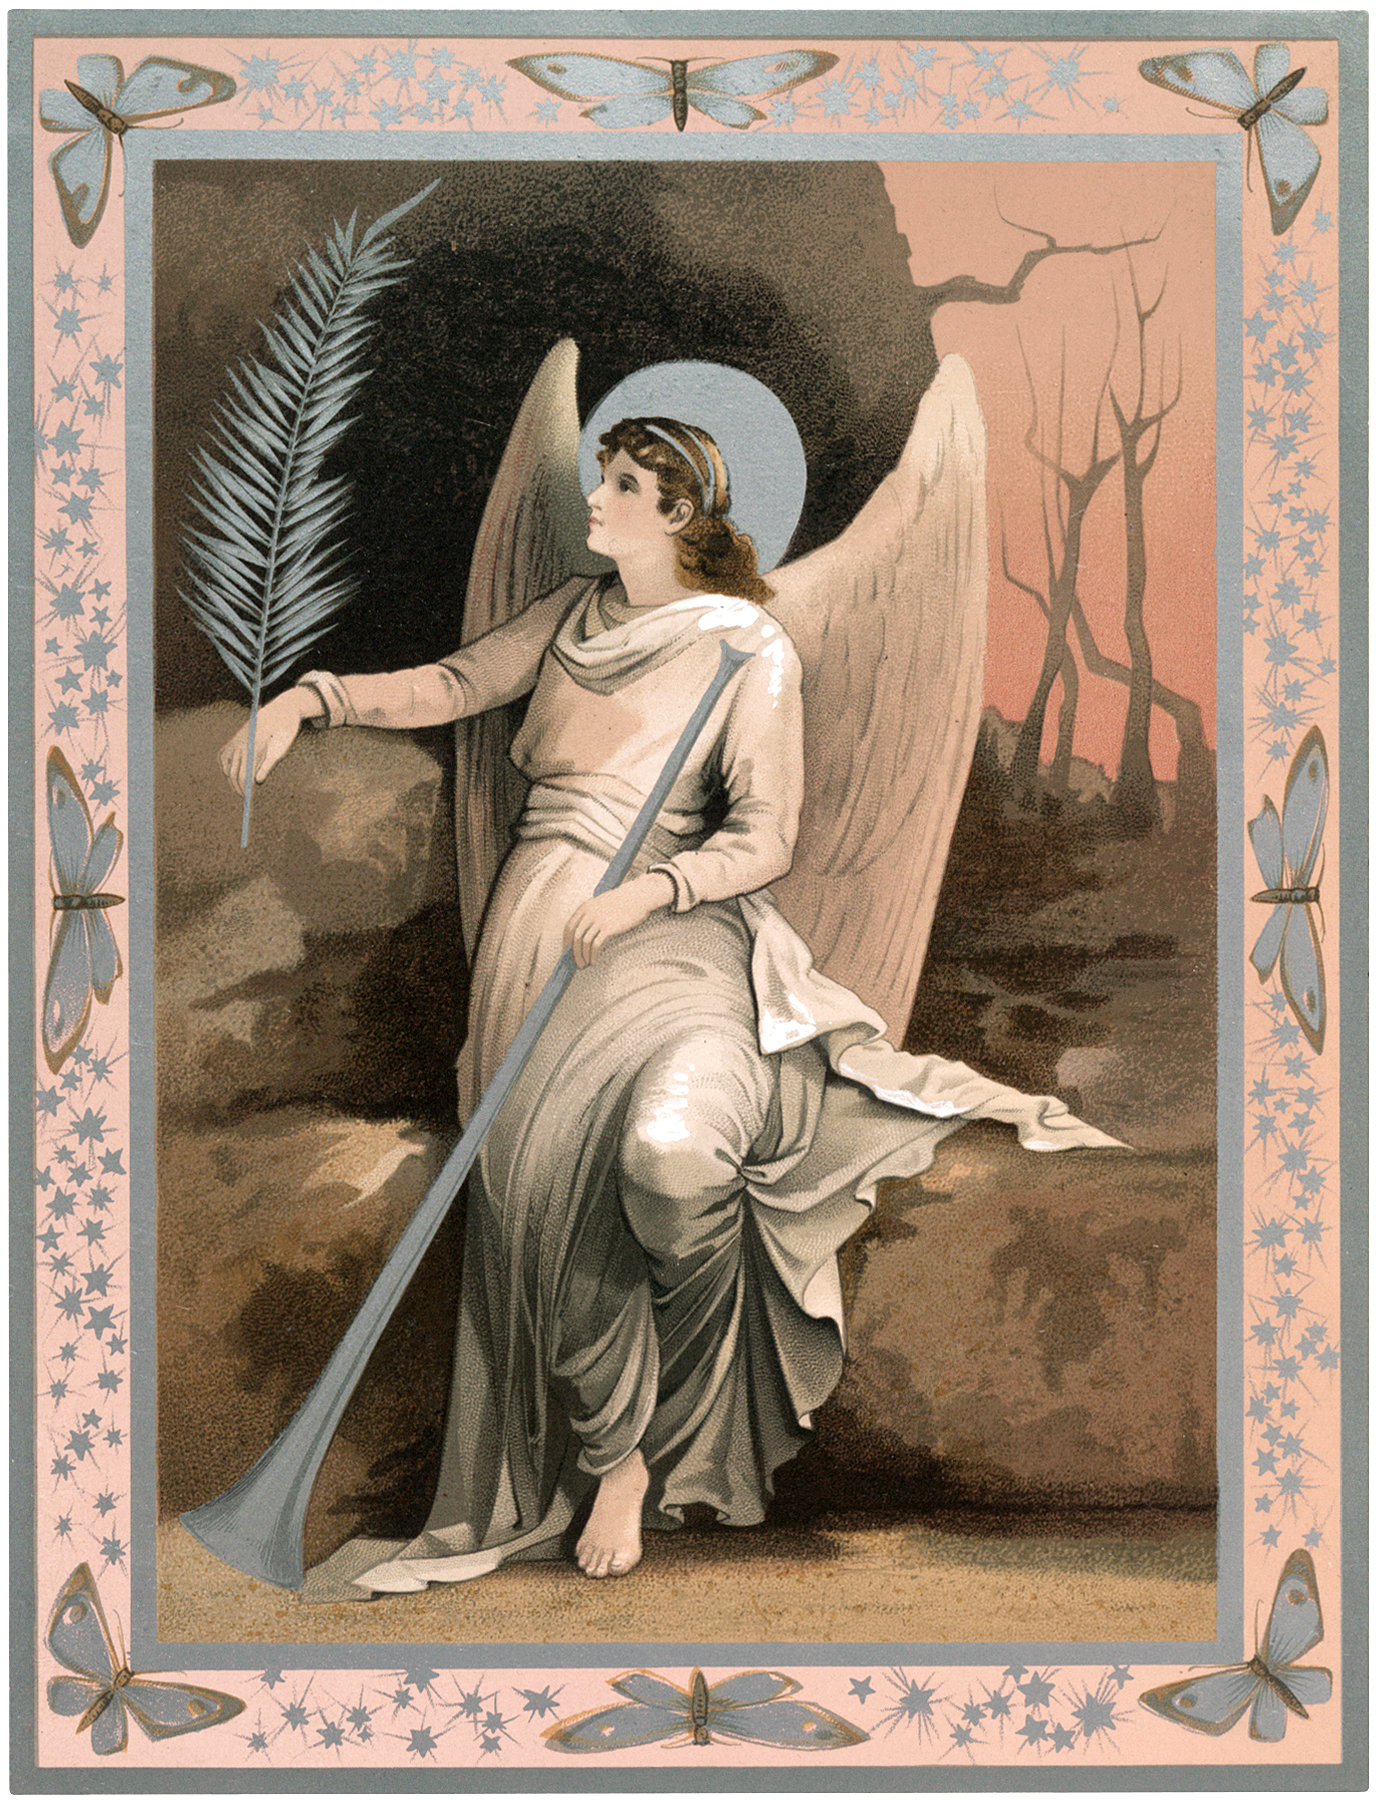 Pastel Easter Angel Image